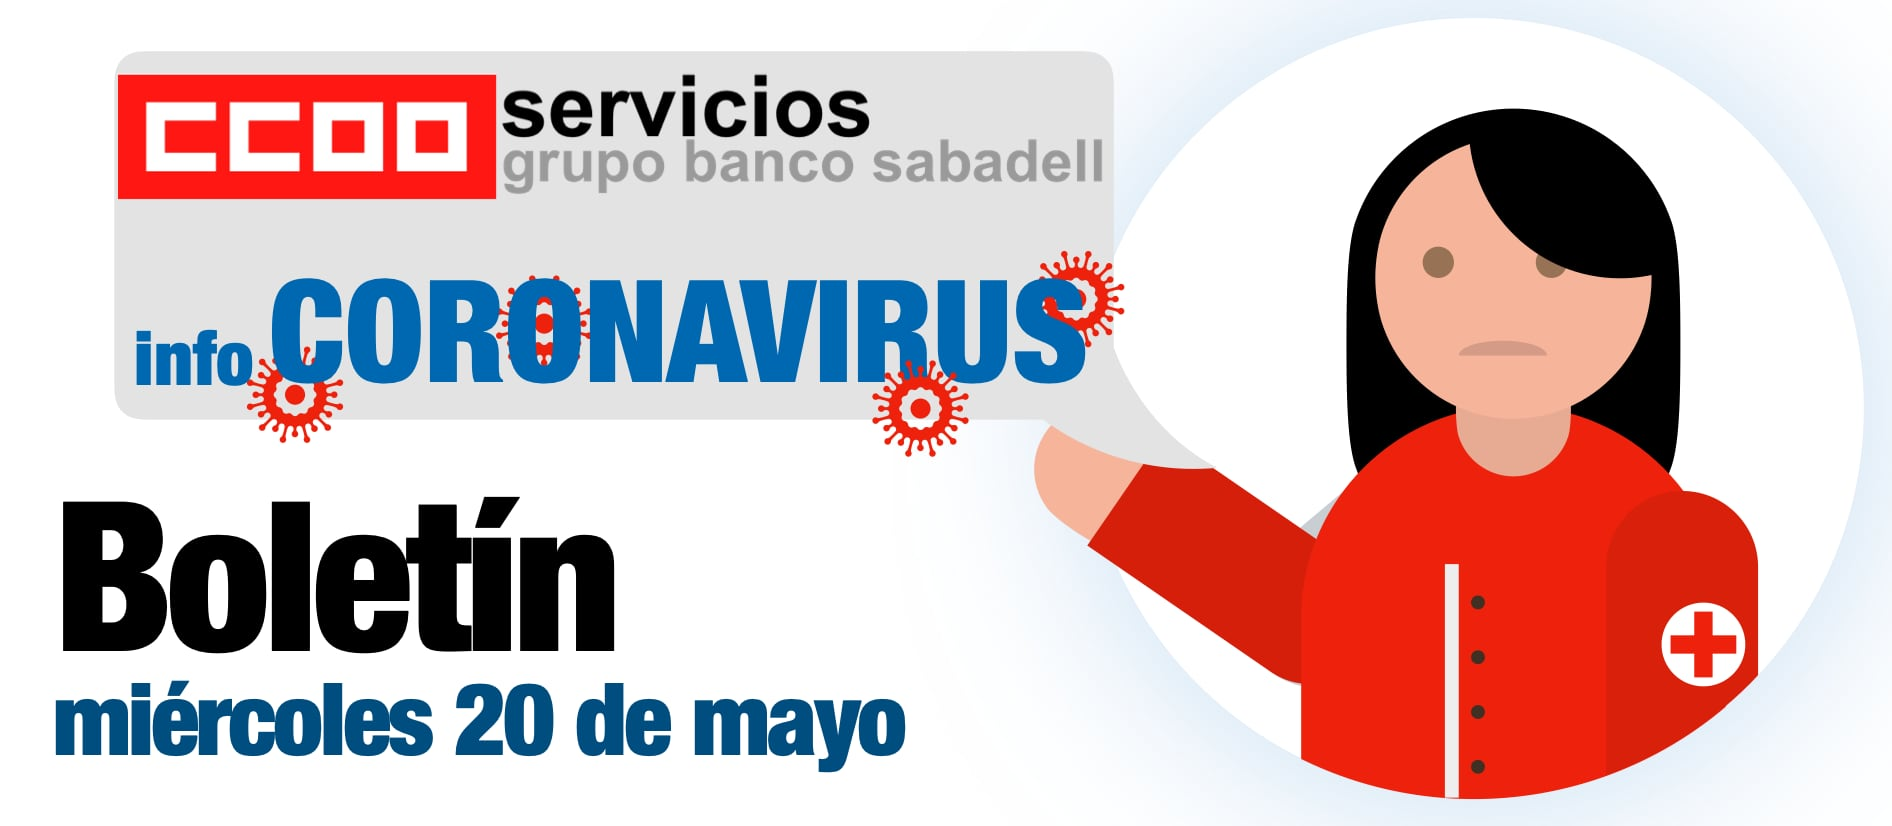 Boletin Coronavirus Banc Sabaell Introduccion